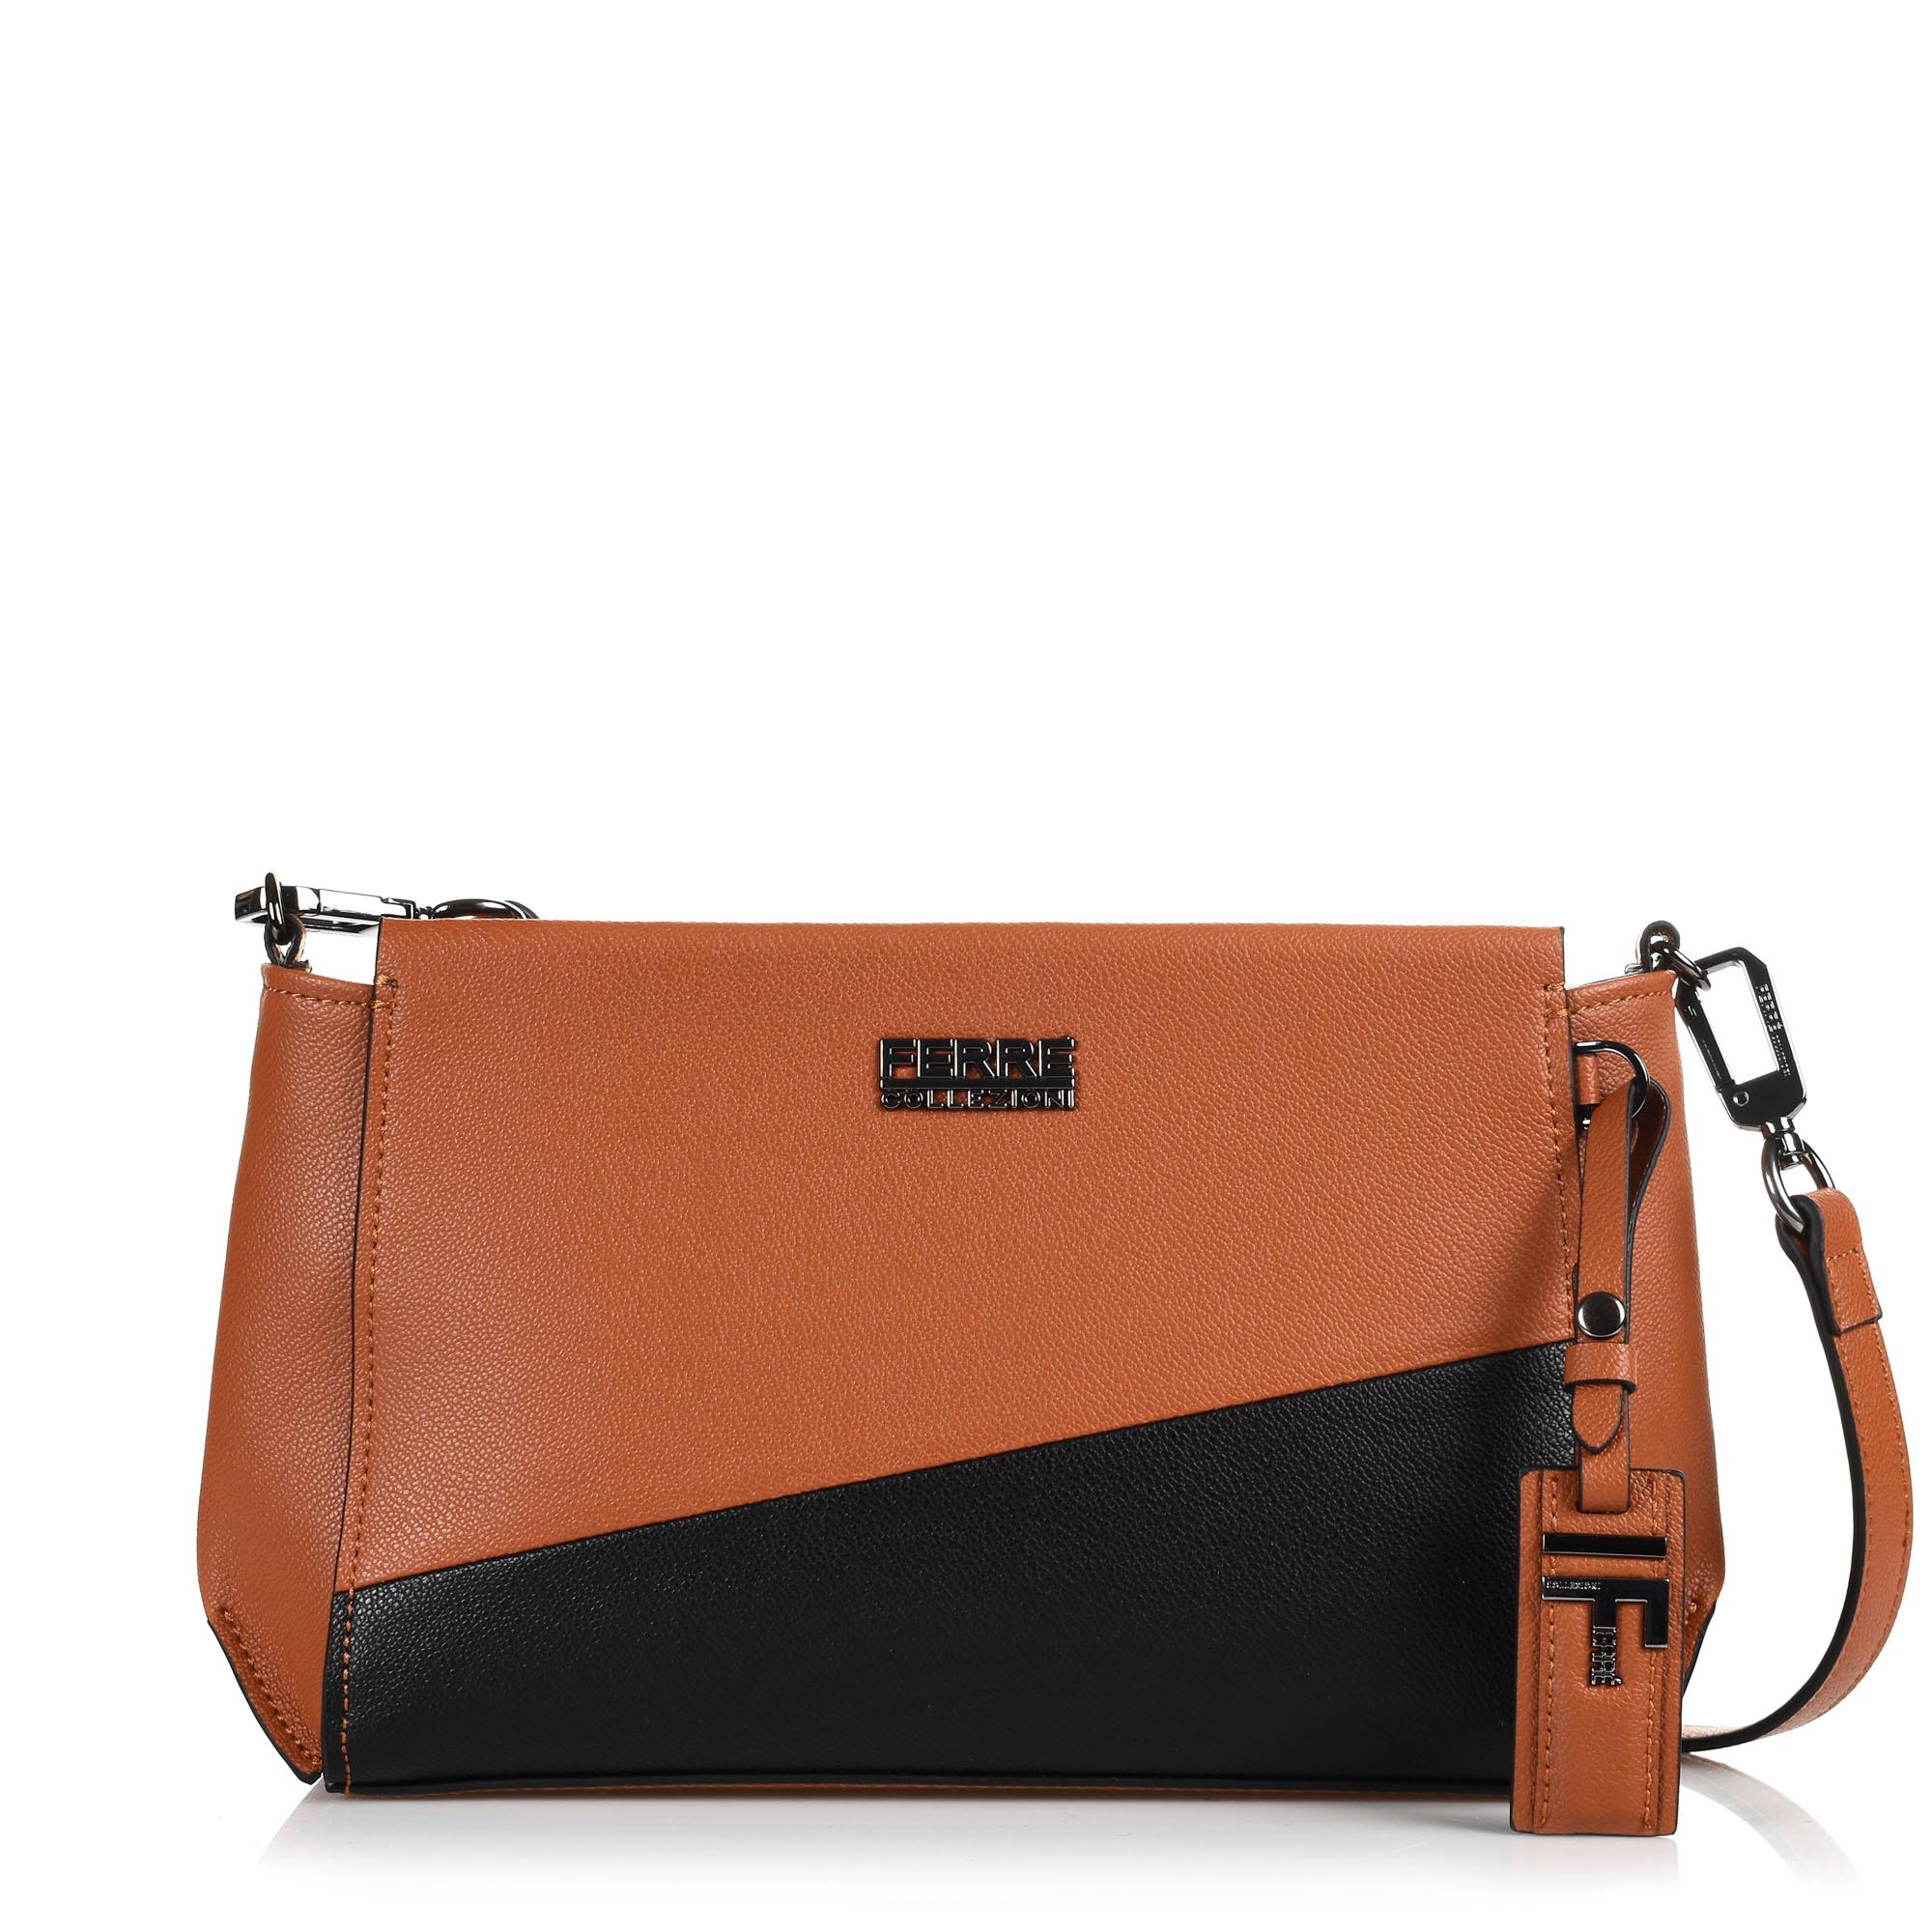 fbdb78a01c Brand Bags Δερμάτινη Τσάντα Ώμου-Χιαστί Ferre Volga IFD1N5.045